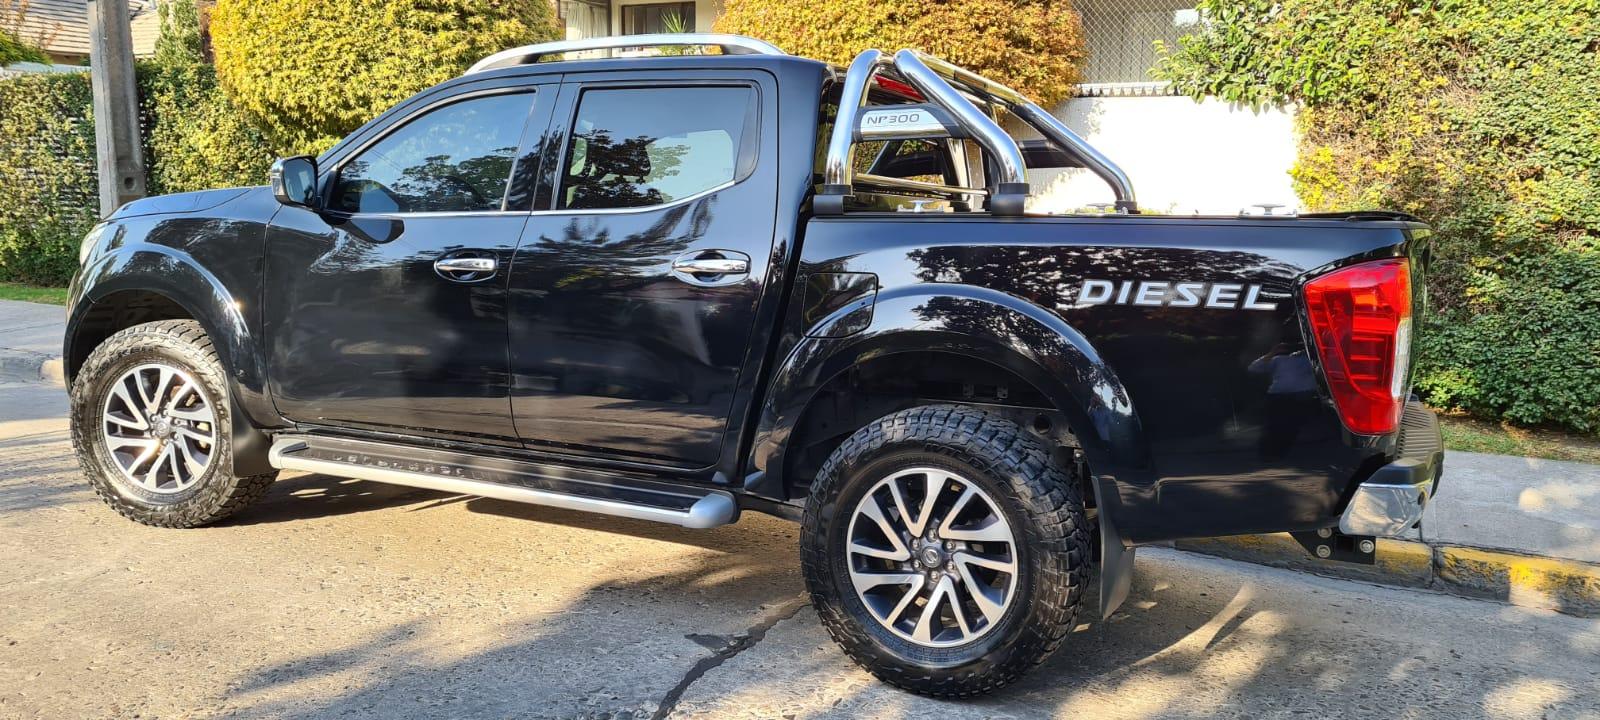 Nissan NP300 Version 2.3 DC LE 2.3D AT 4WD año 2018